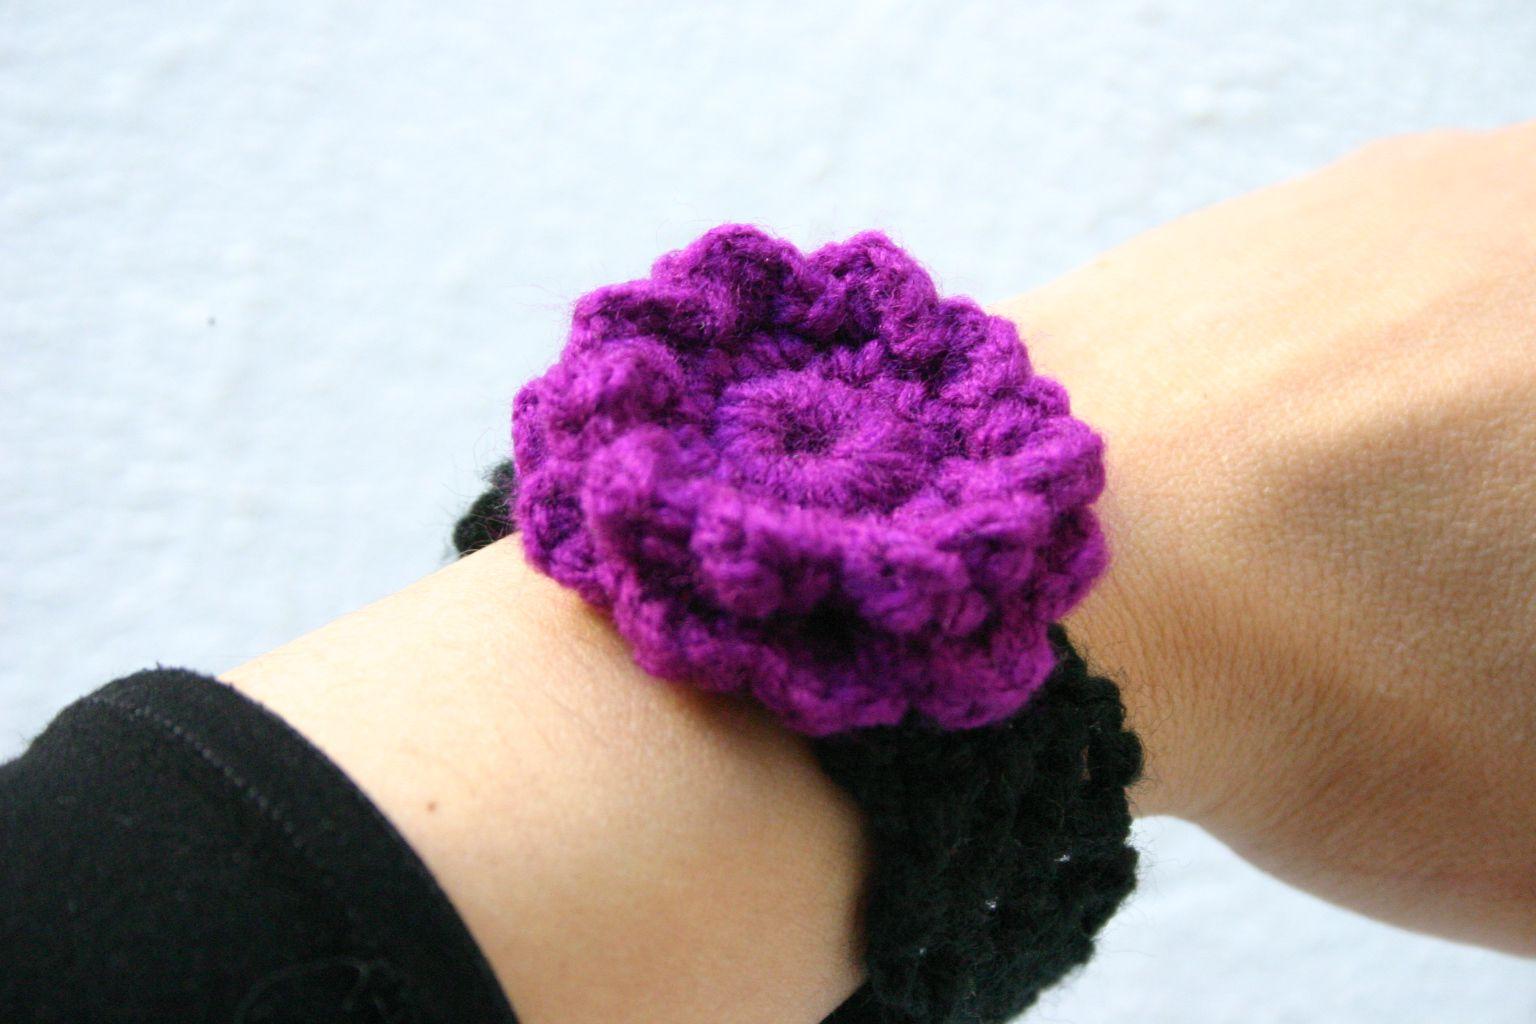 vintage jewelery boho bracelet cotton textile jewelry crochet accessory